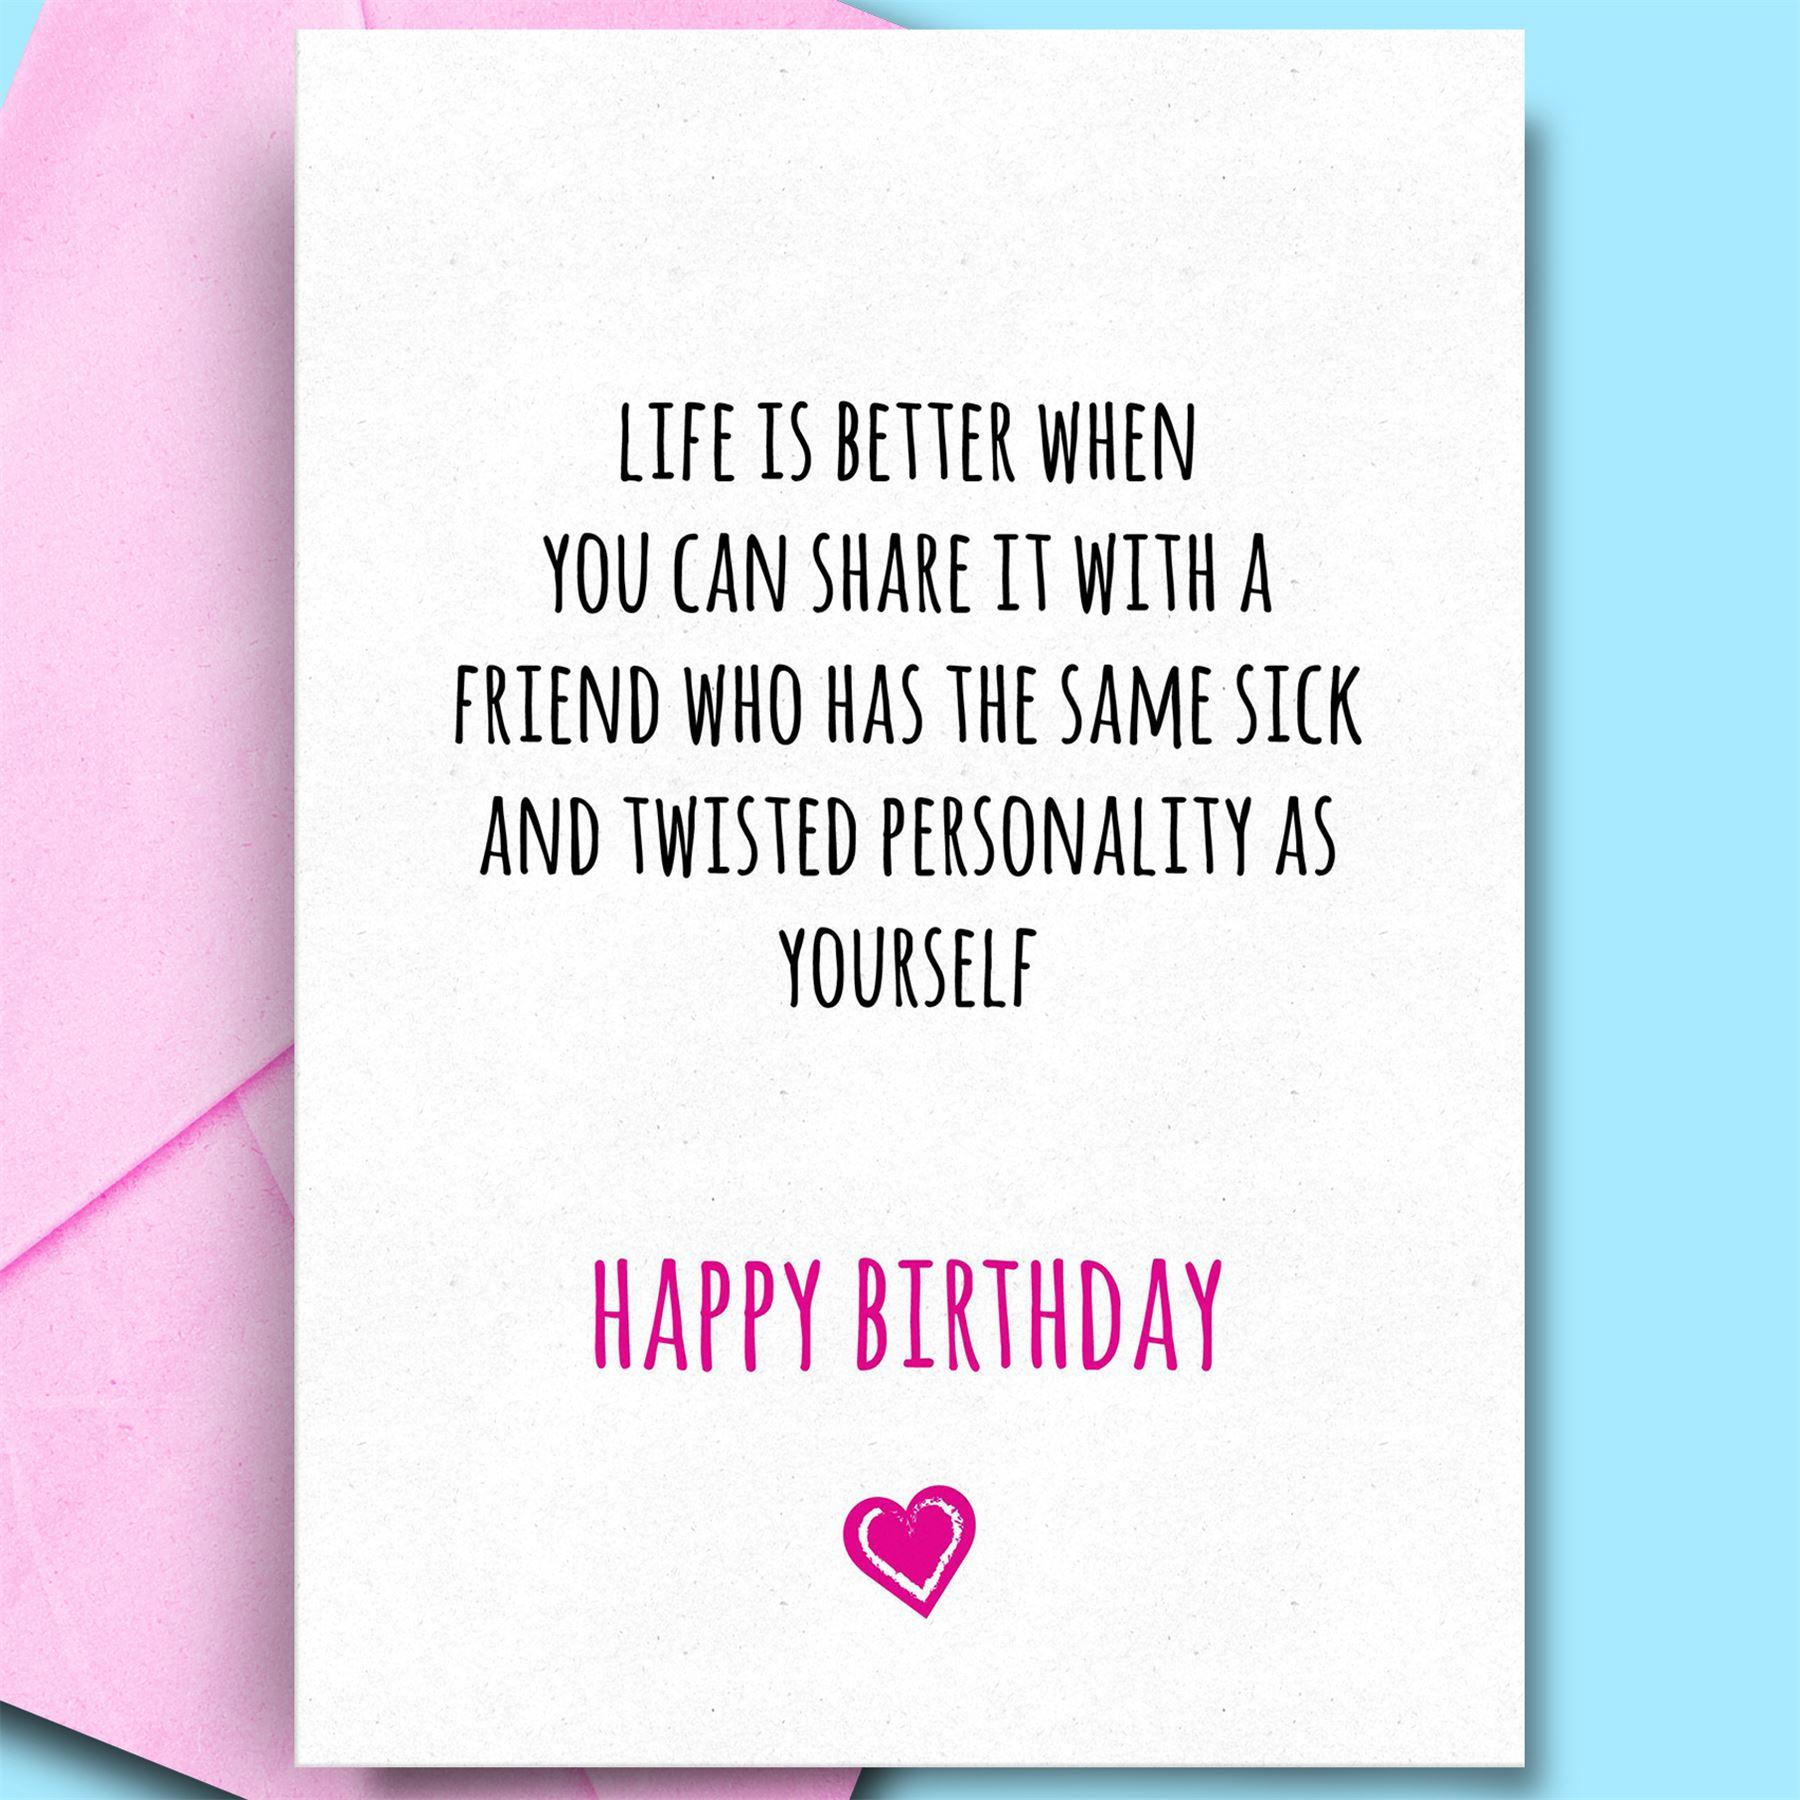 Valentine Card Design Birthday Card Happy Birthday Dad From Daughter Funny